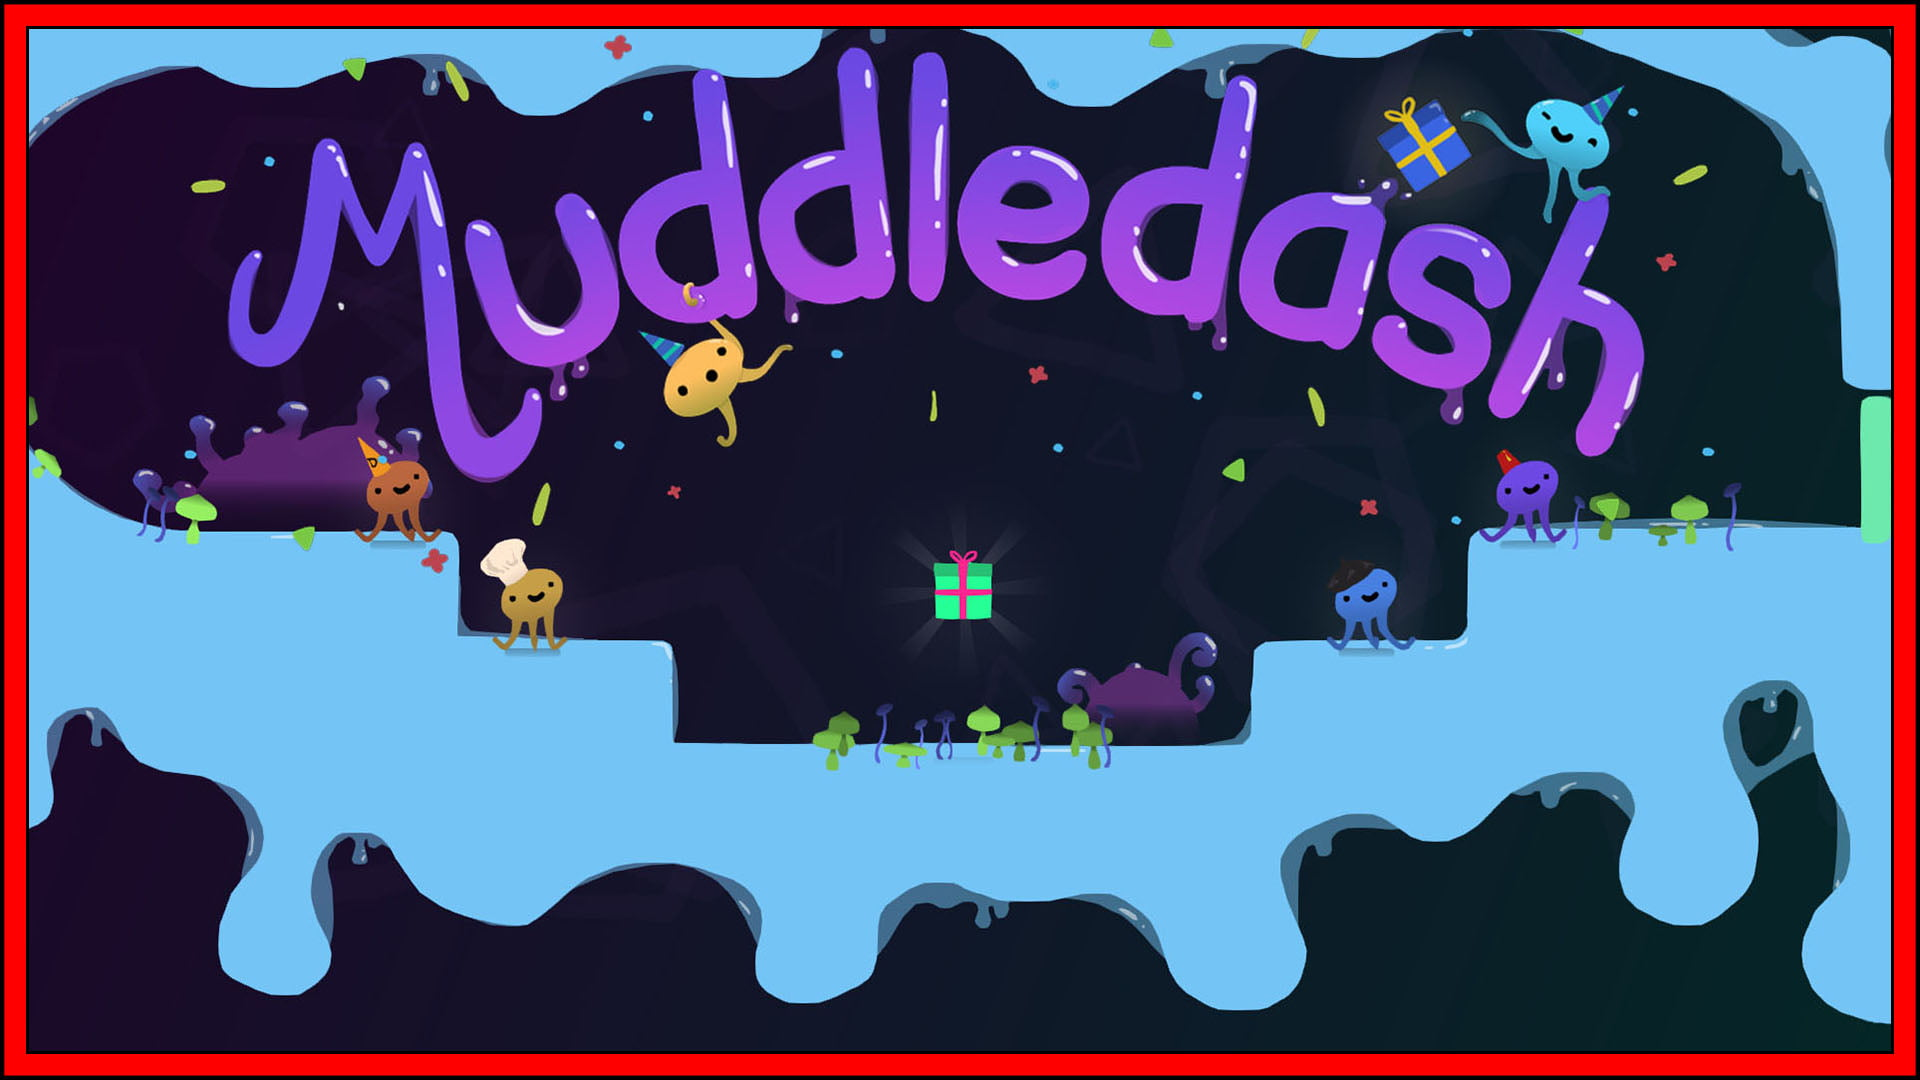 Muddledash (Nintendo Switch) Video Review